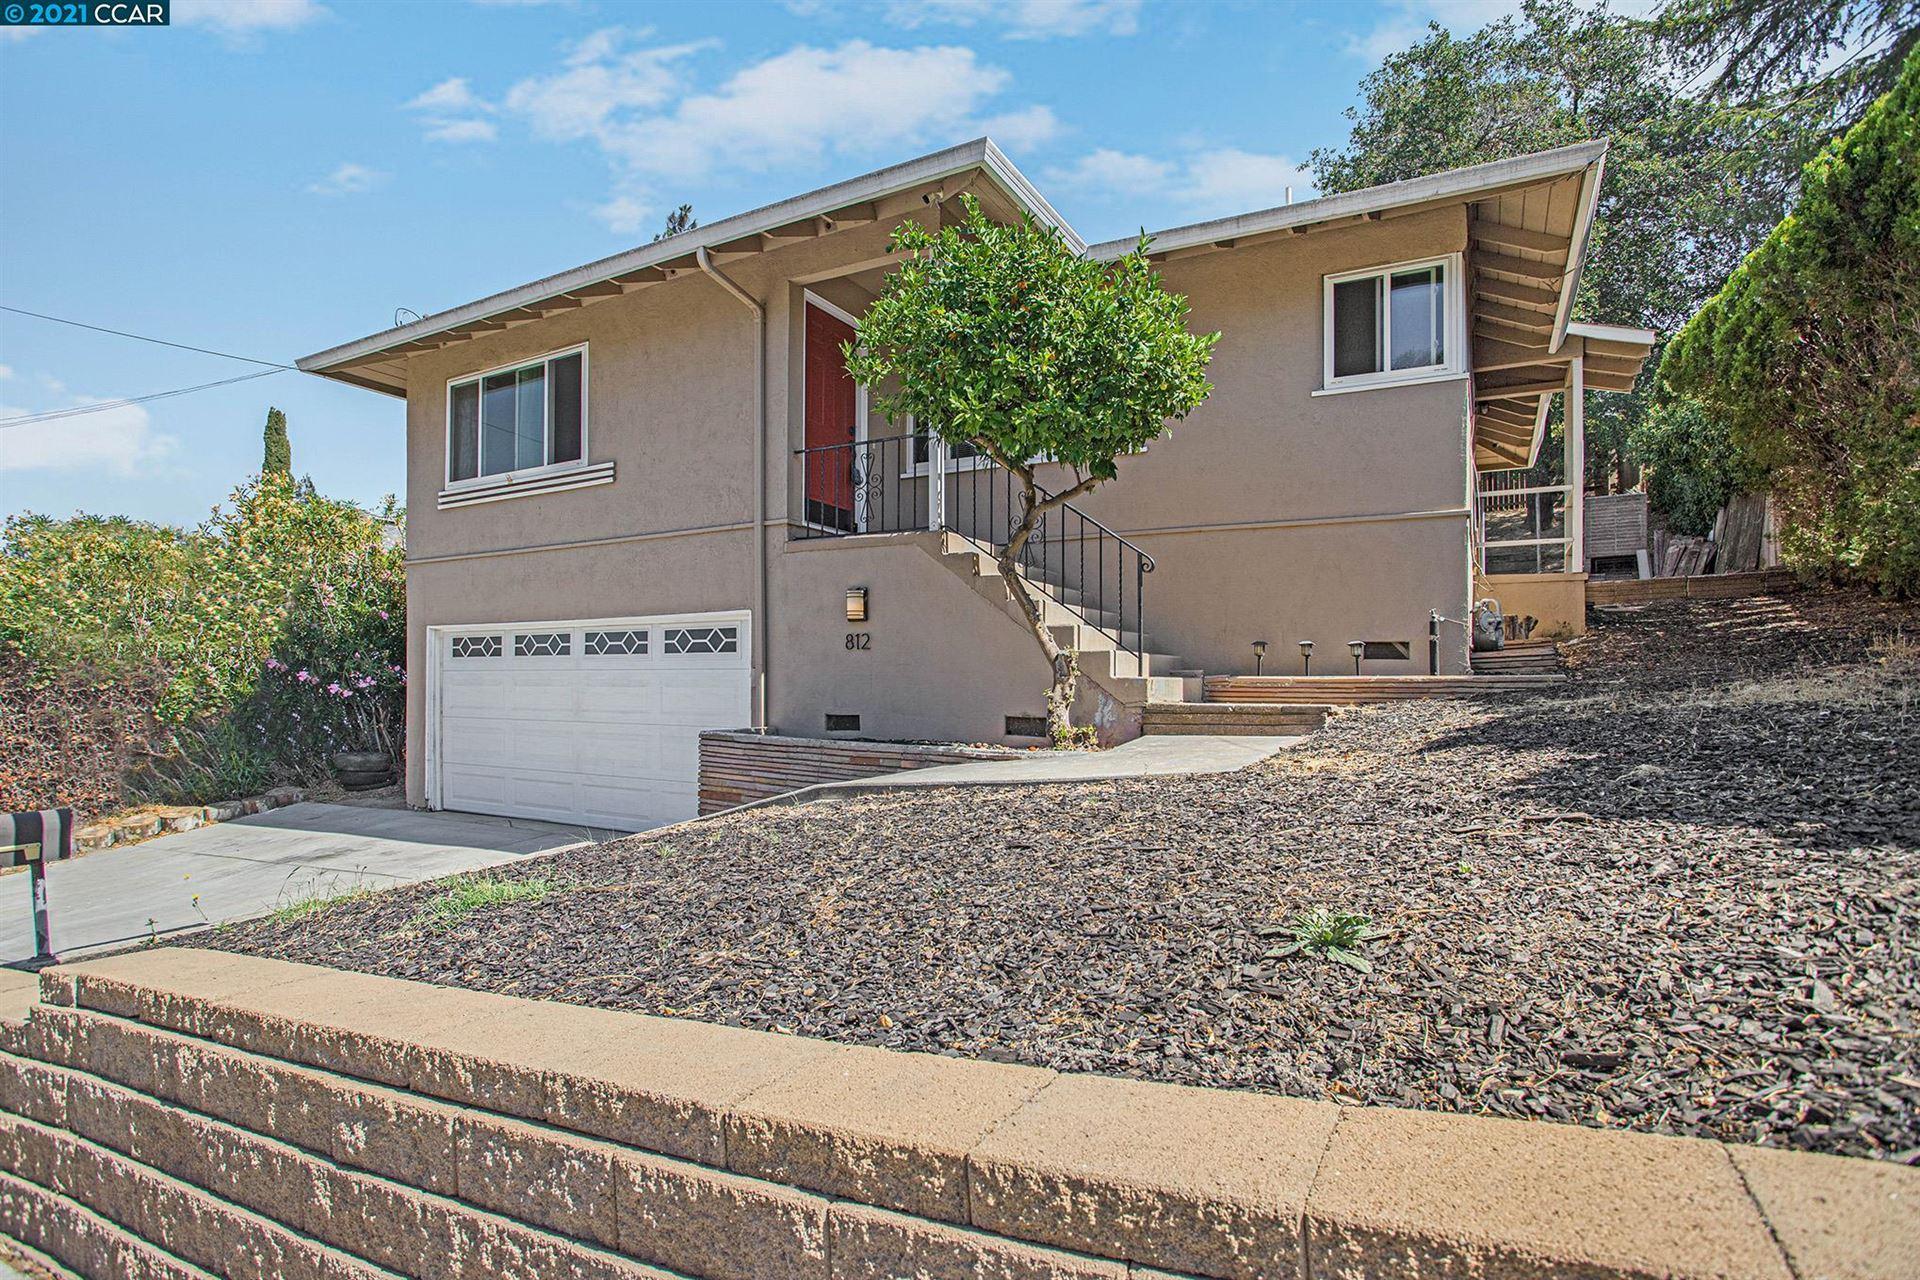 Photo of 812 Shell Ave, MARTINEZ, CA 94553 (MLS # 40966347)